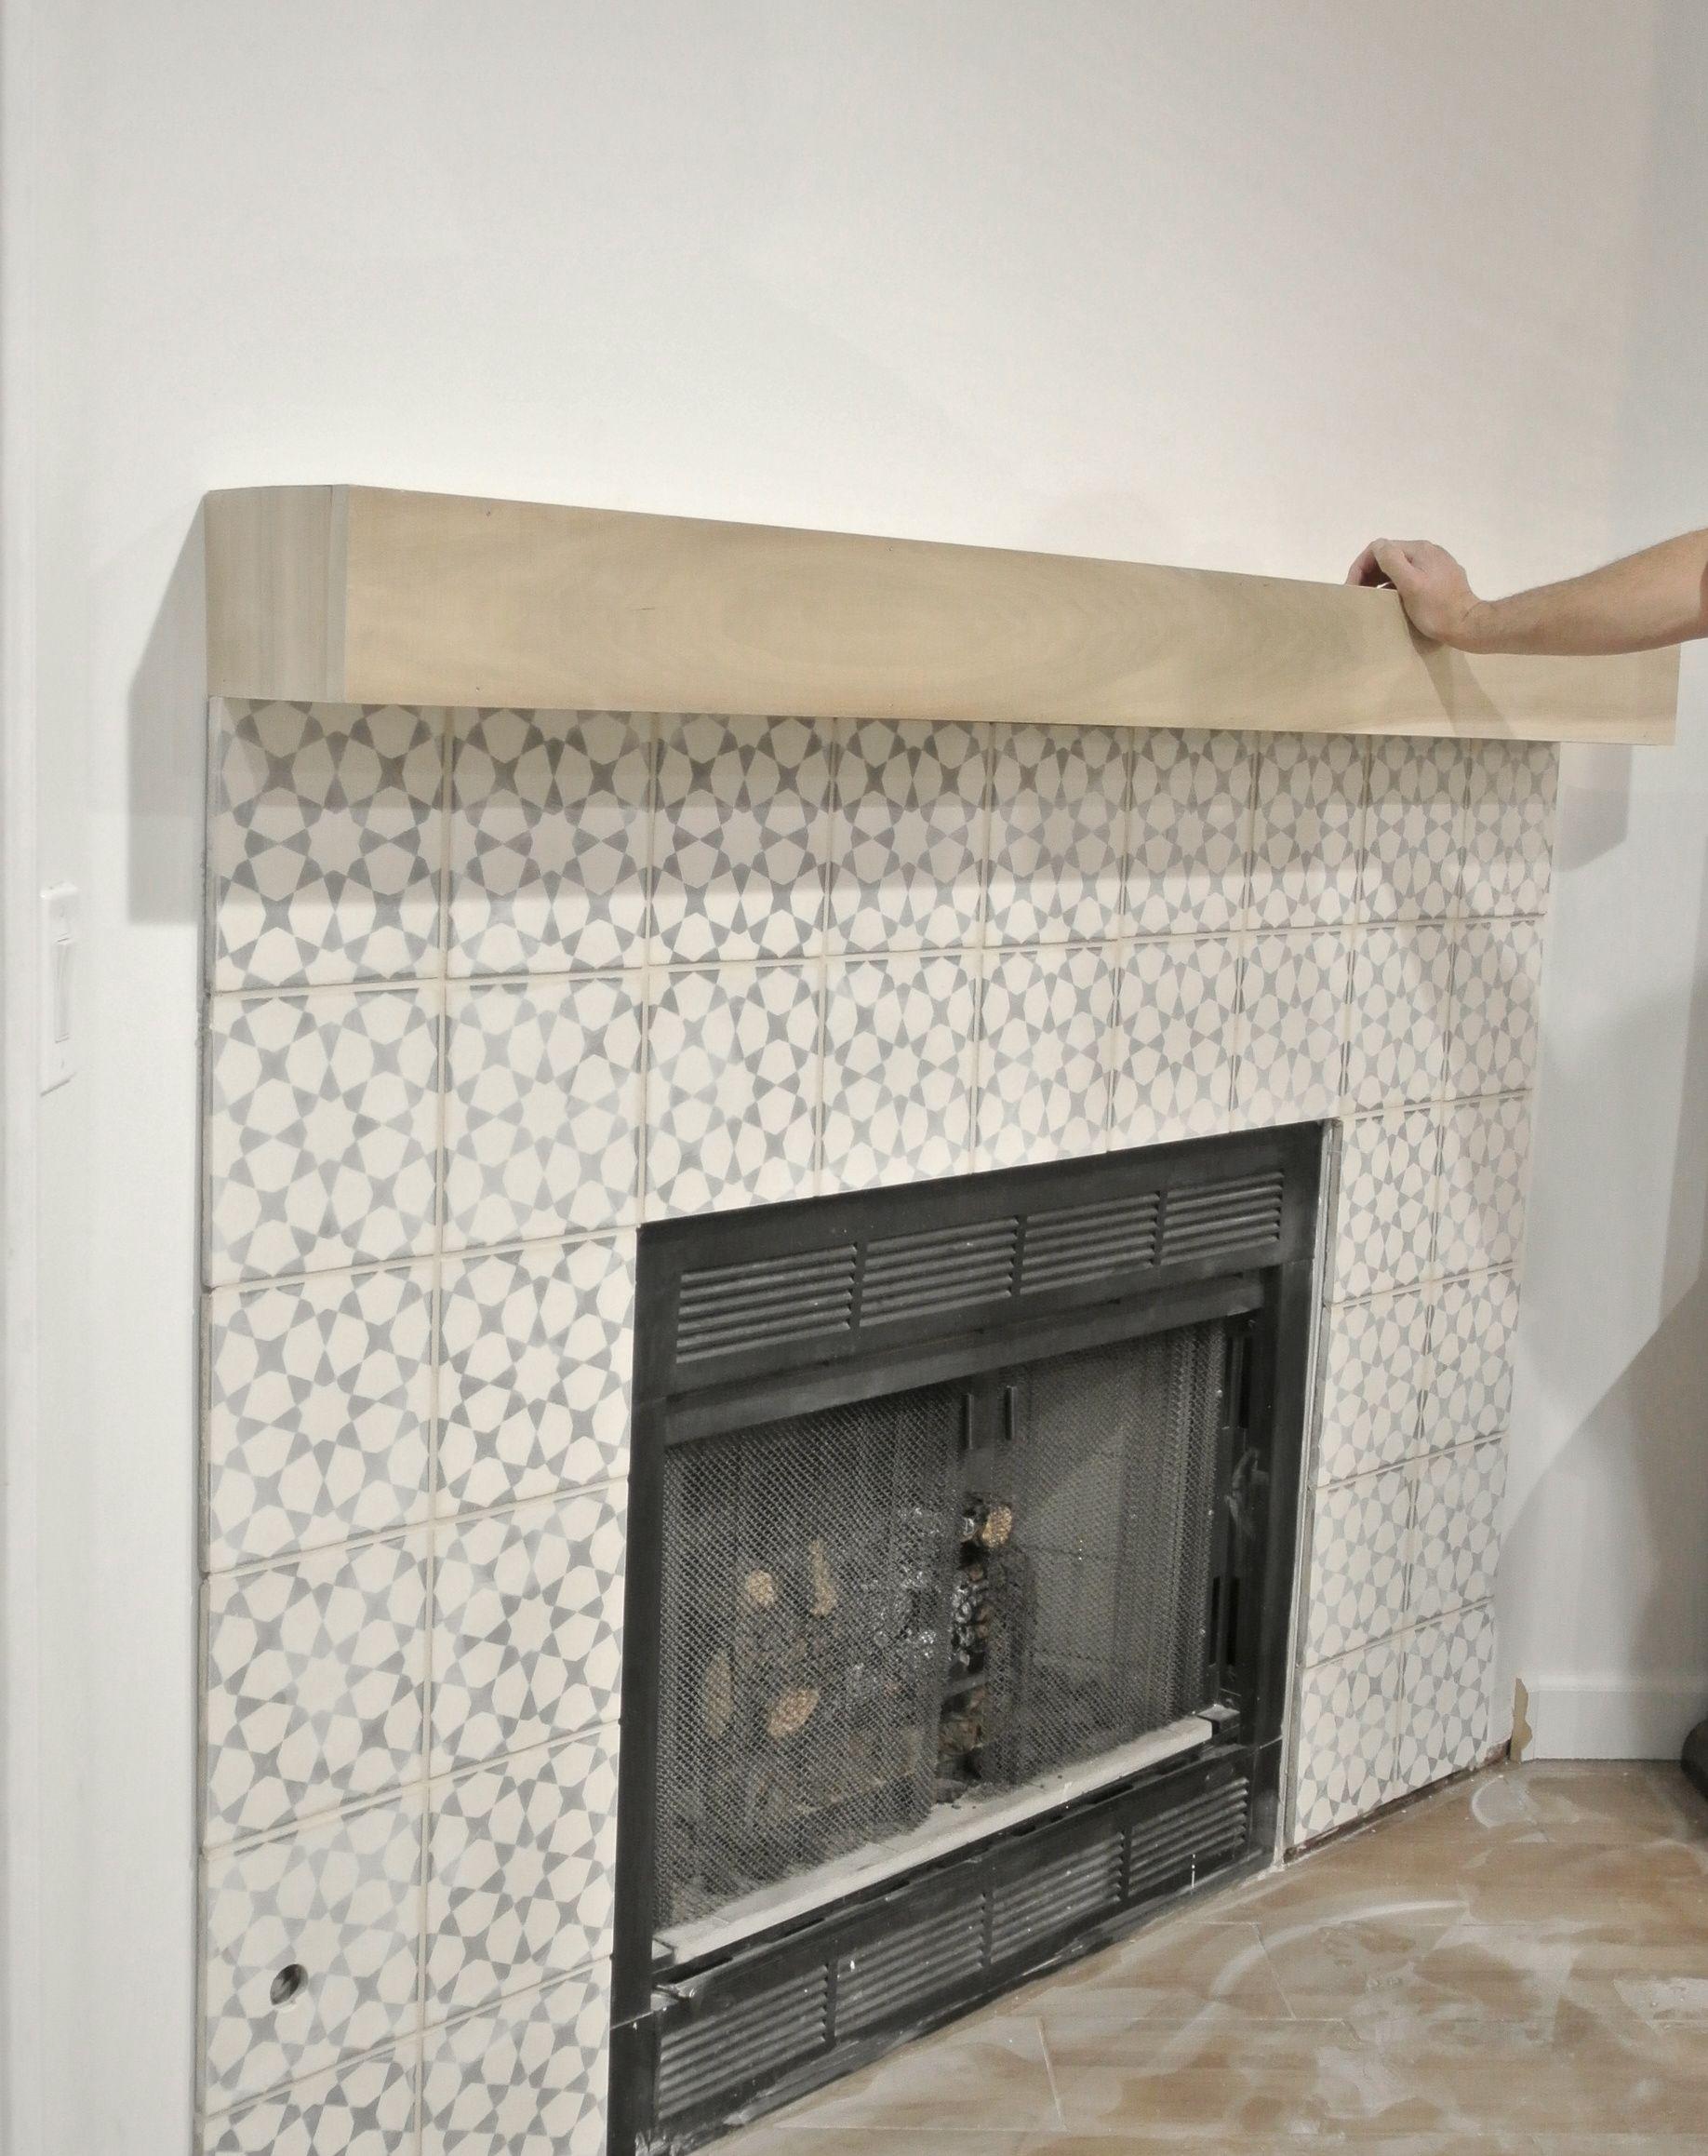 DIY Fireplace Makeover Diy fireplace, Fireplace remodel